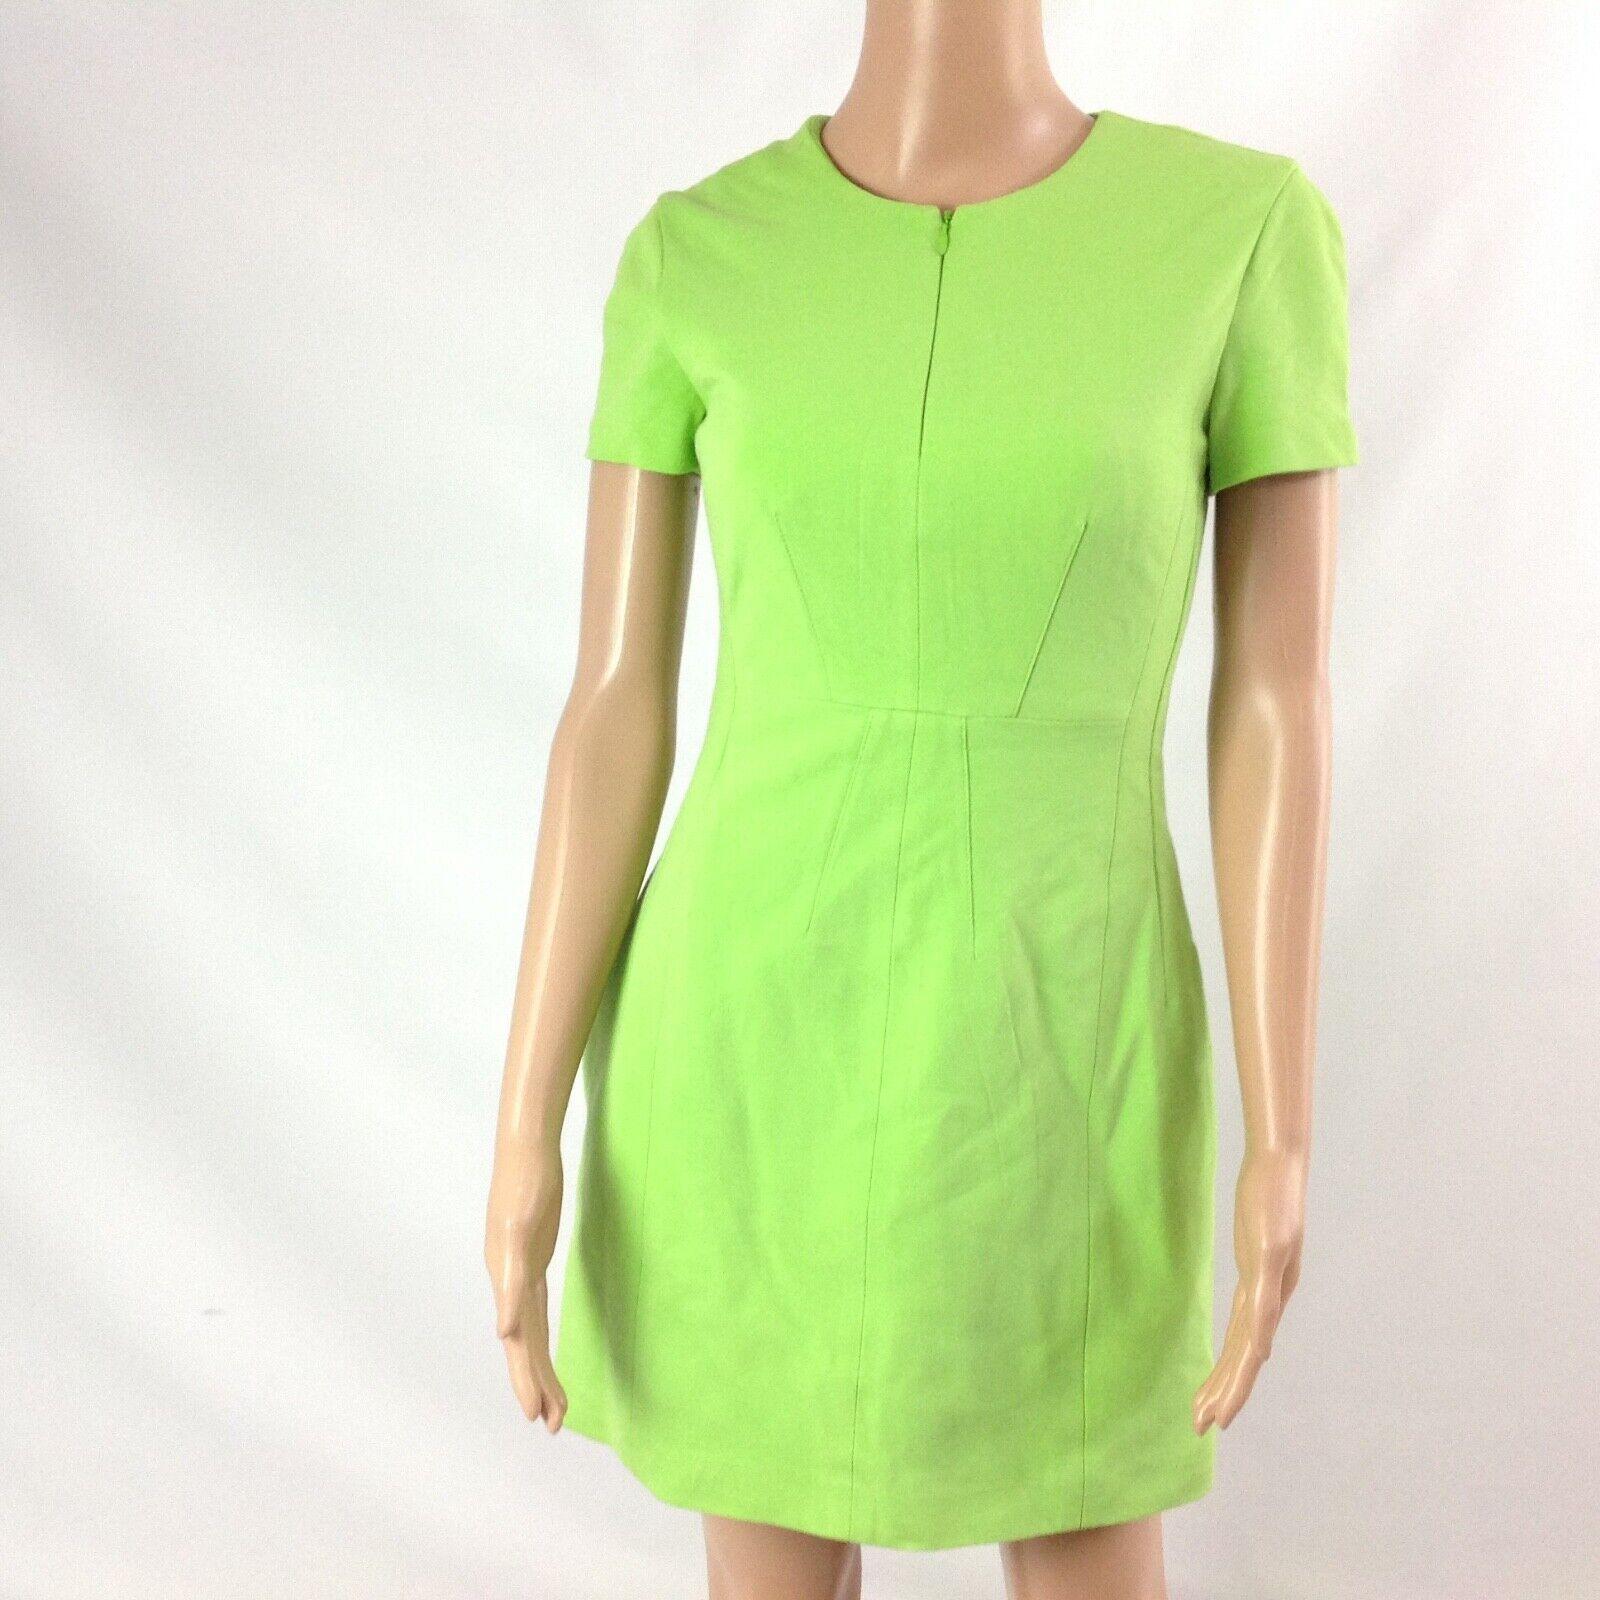 Diana von Furstenberg Agatha Knit Suiting Lime Gr… - image 4